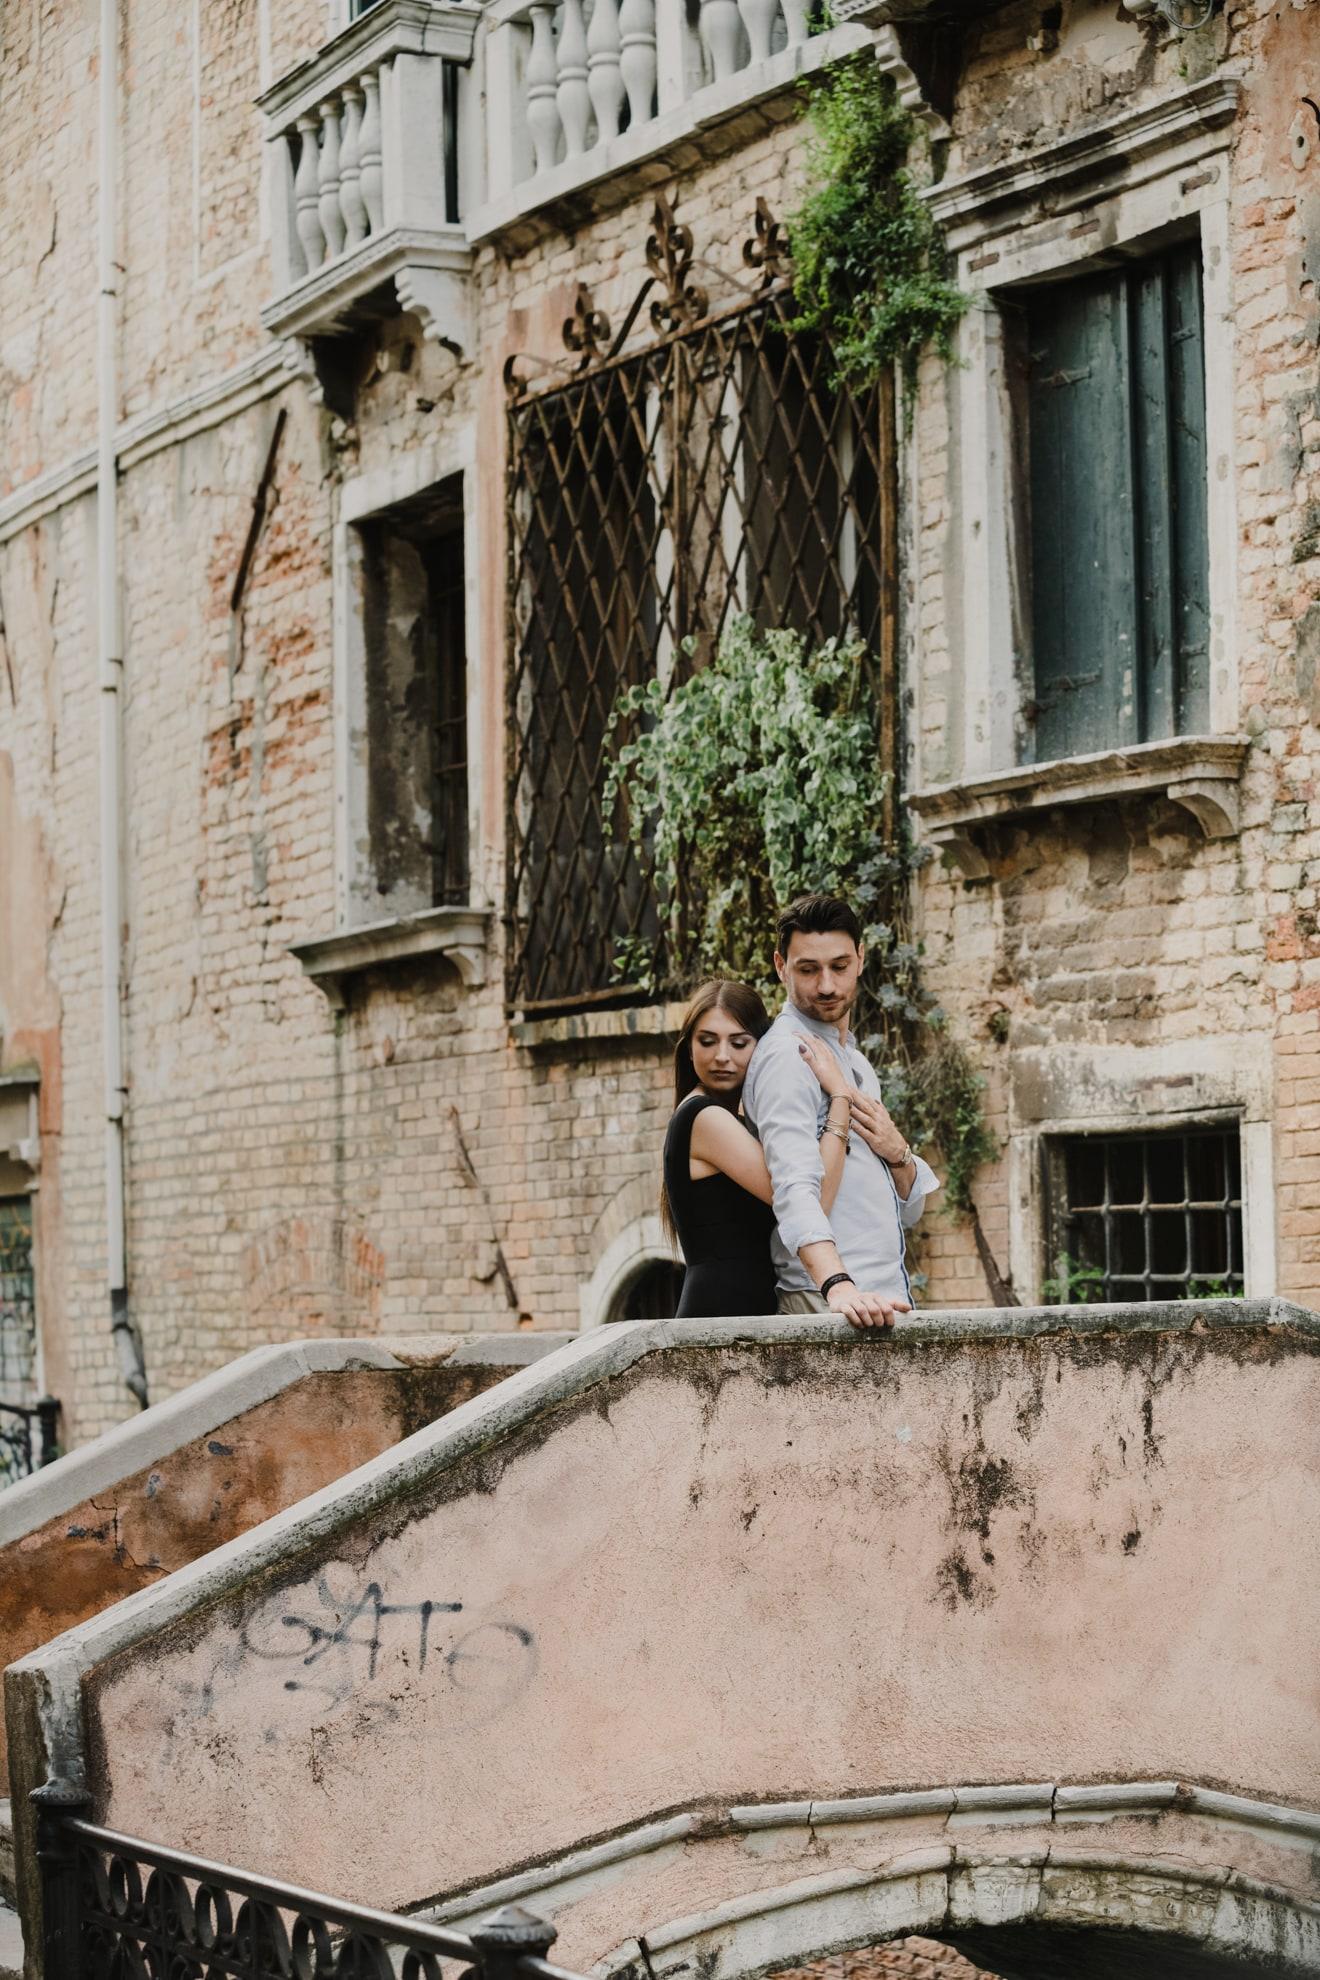 engagement venice venezia proposal proposta matrimonio fidanzamento irene pollacchi fotografa 12